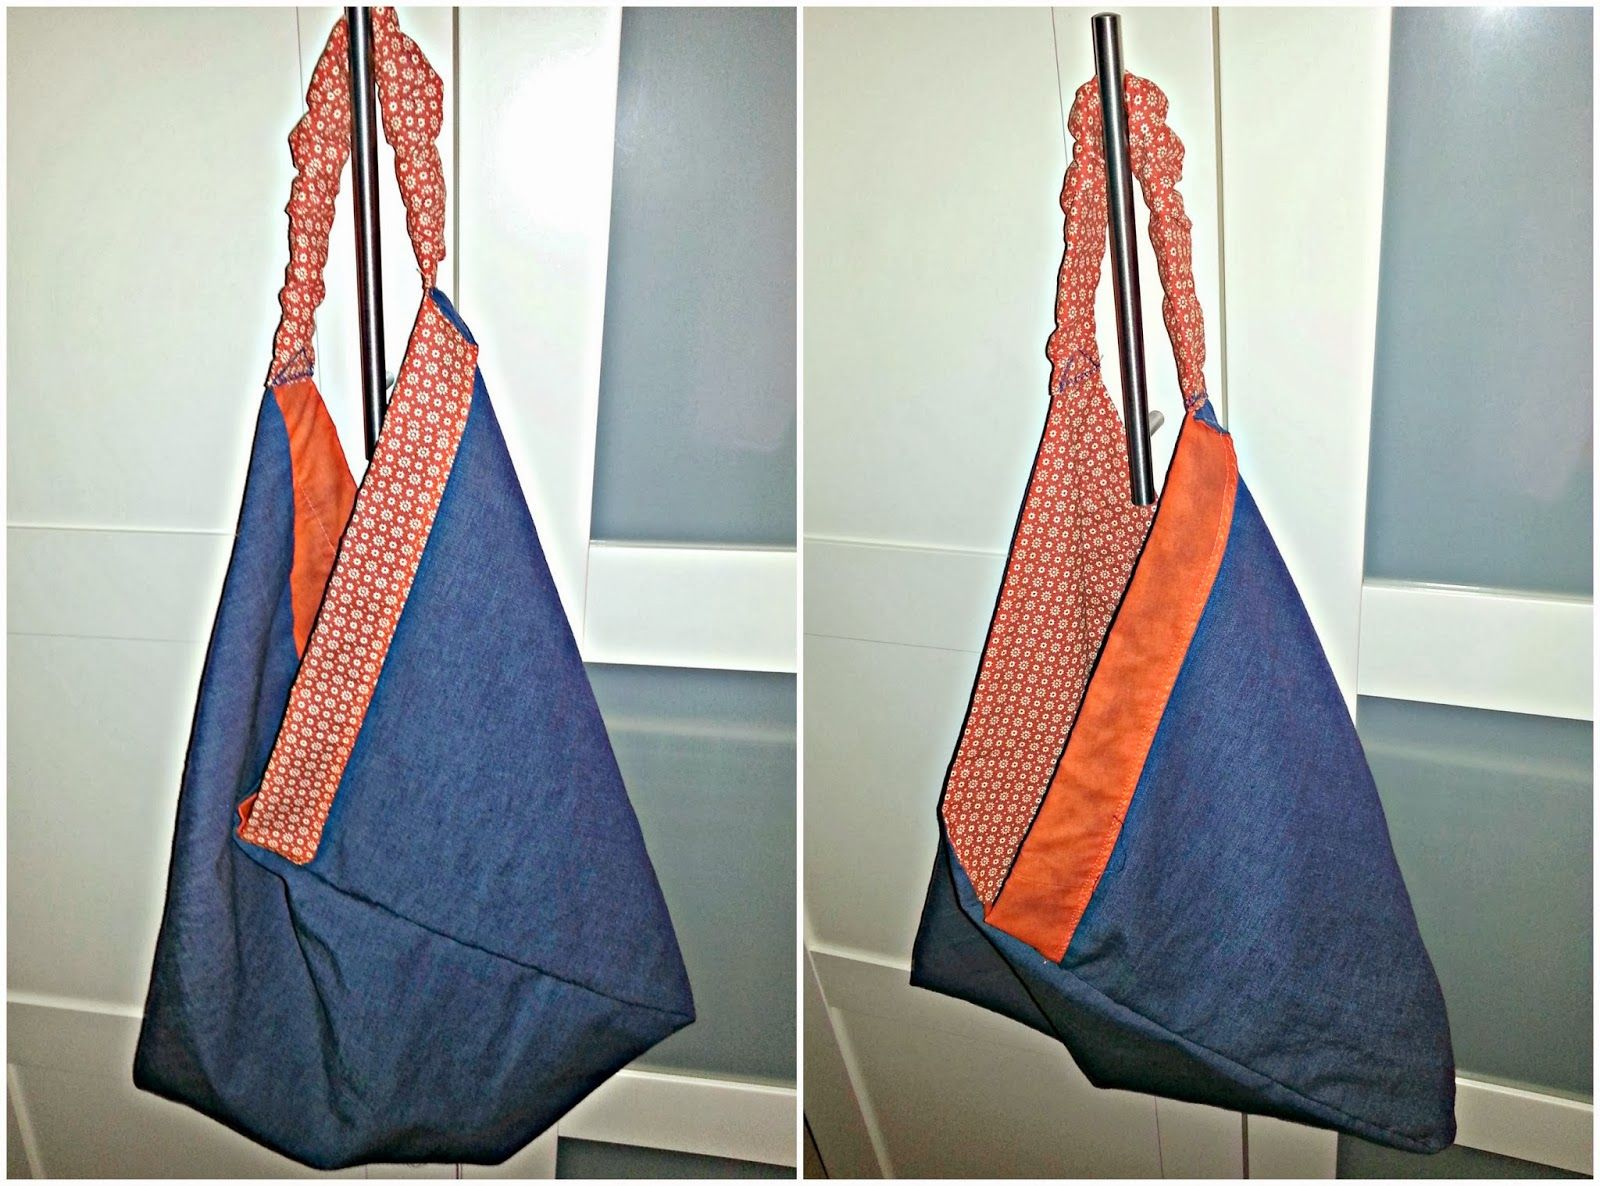 Origami Market Bag aus altem Vorhang / Origami Market Bag made from old curtain / Upcycling